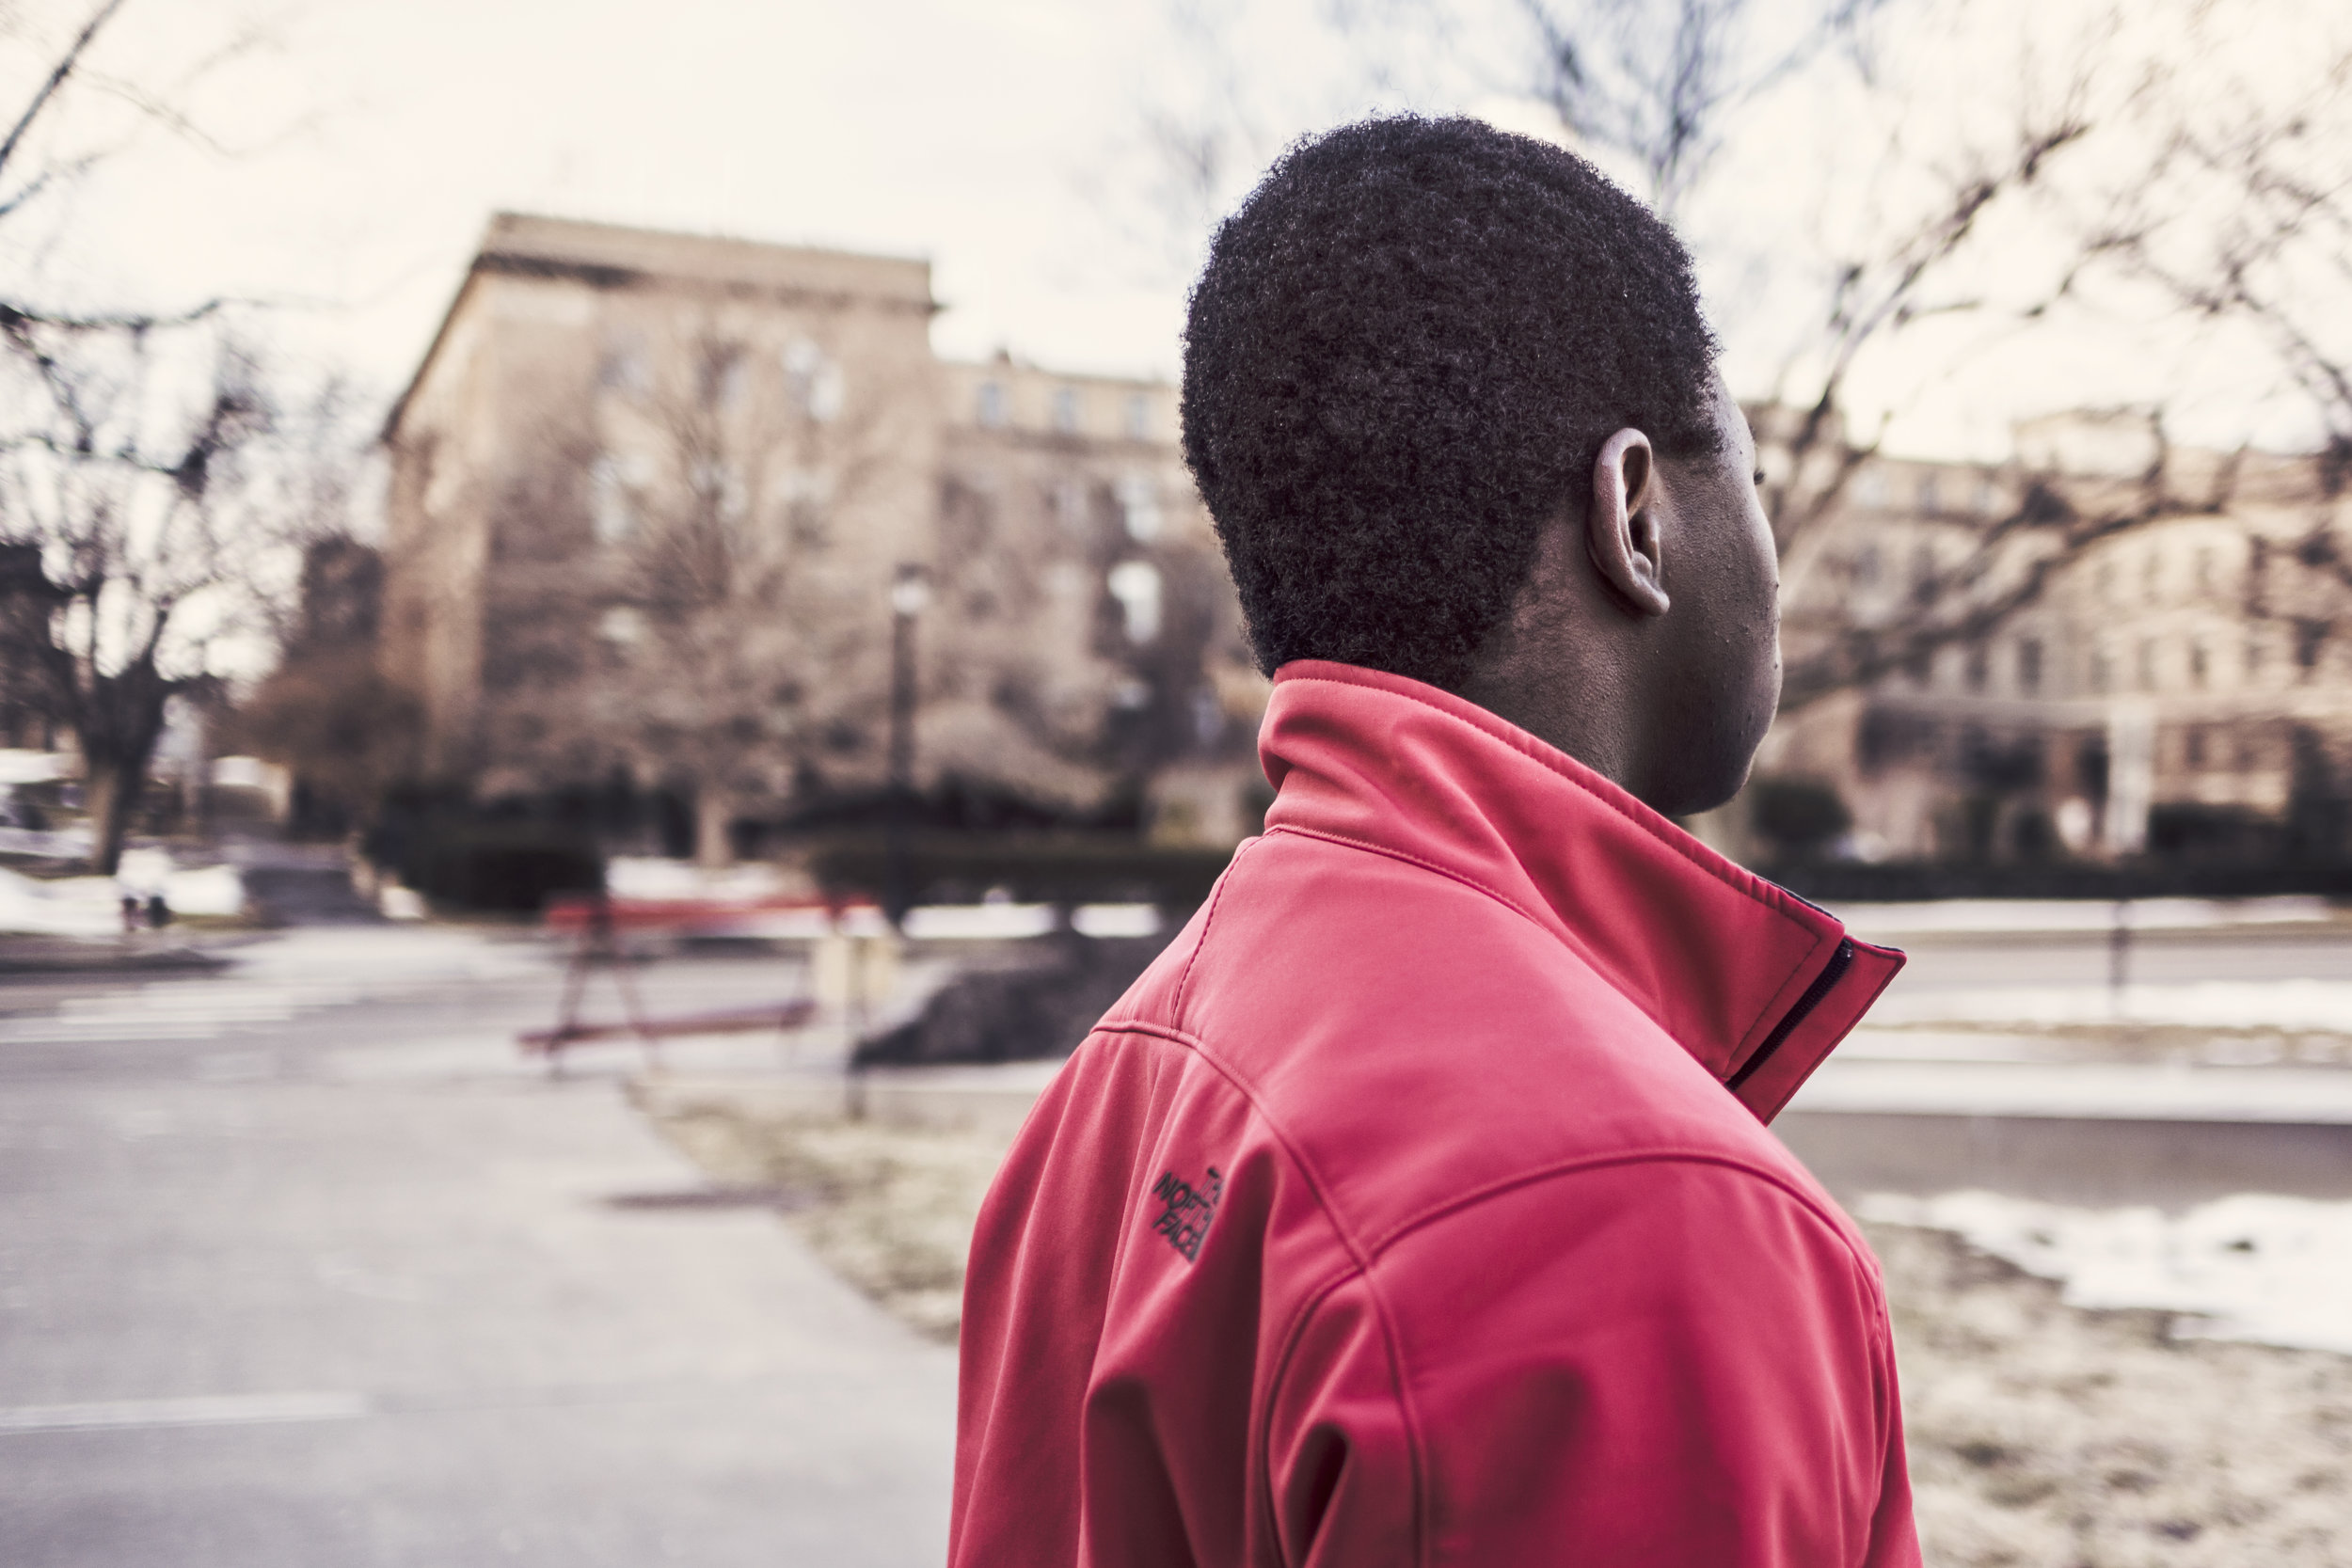 man-person-school-red jacket.jpg